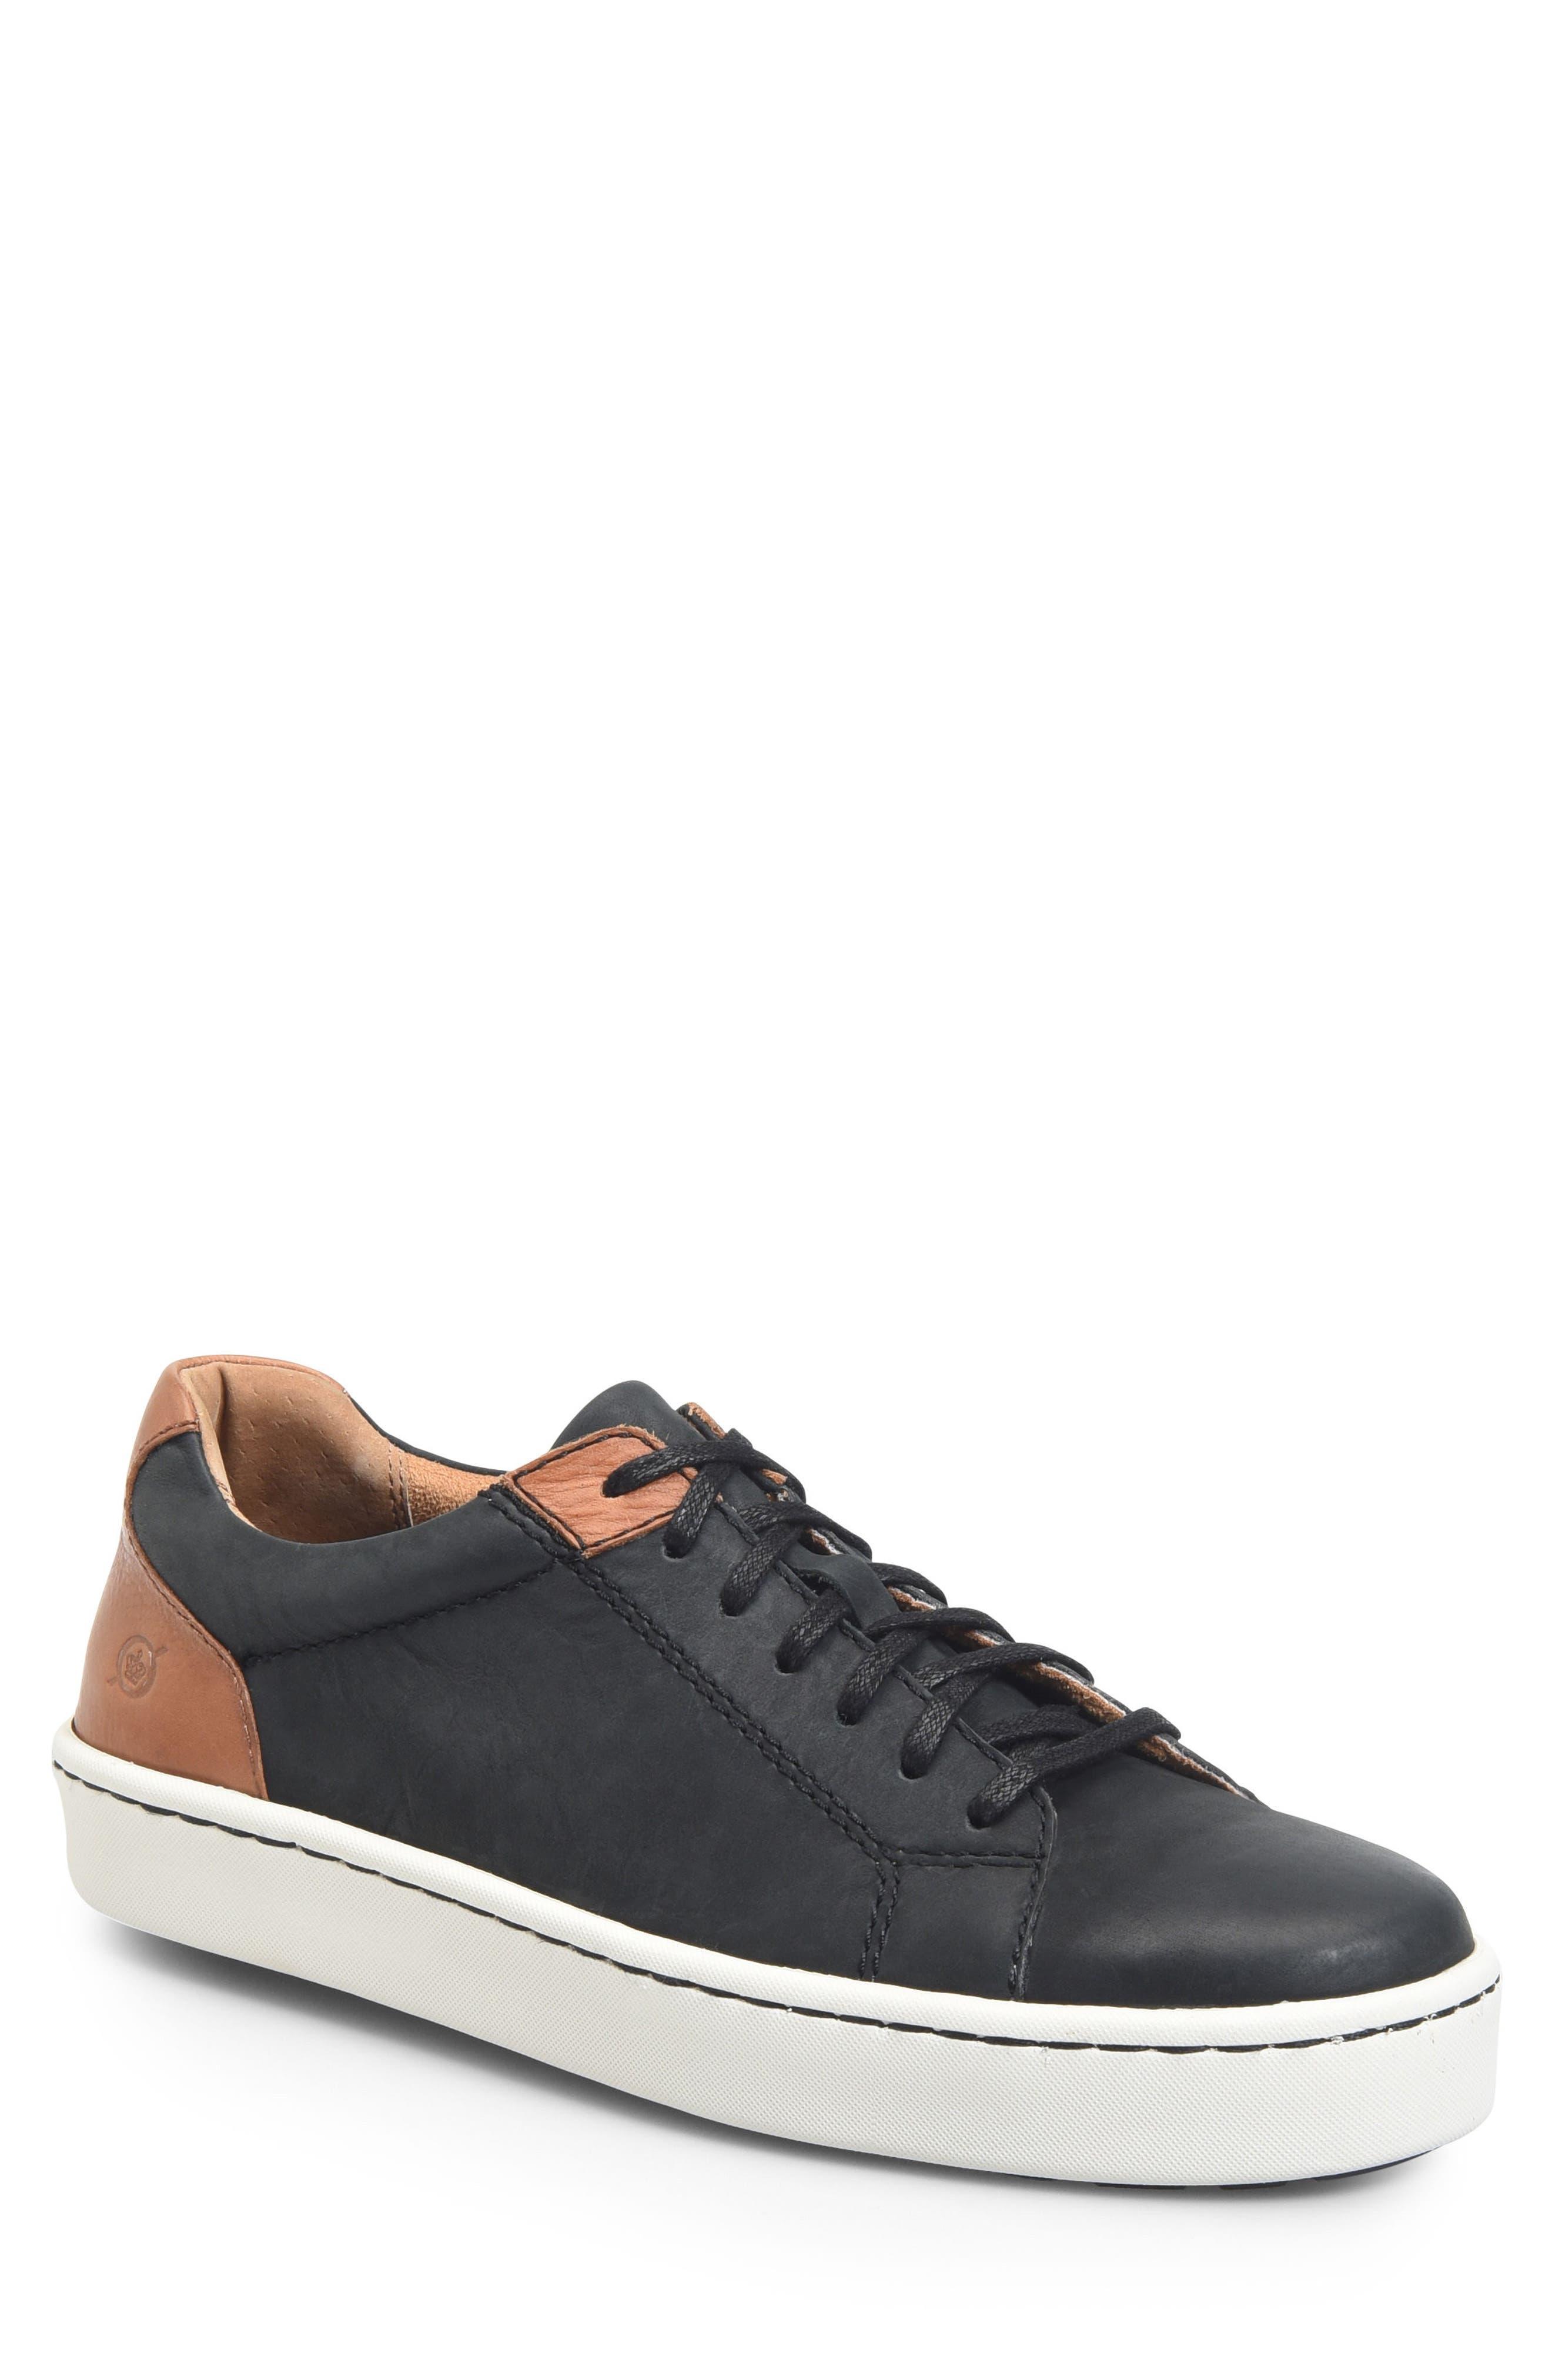 Alternate Image 1 Selected - Børn Jib Sneaker (Men)